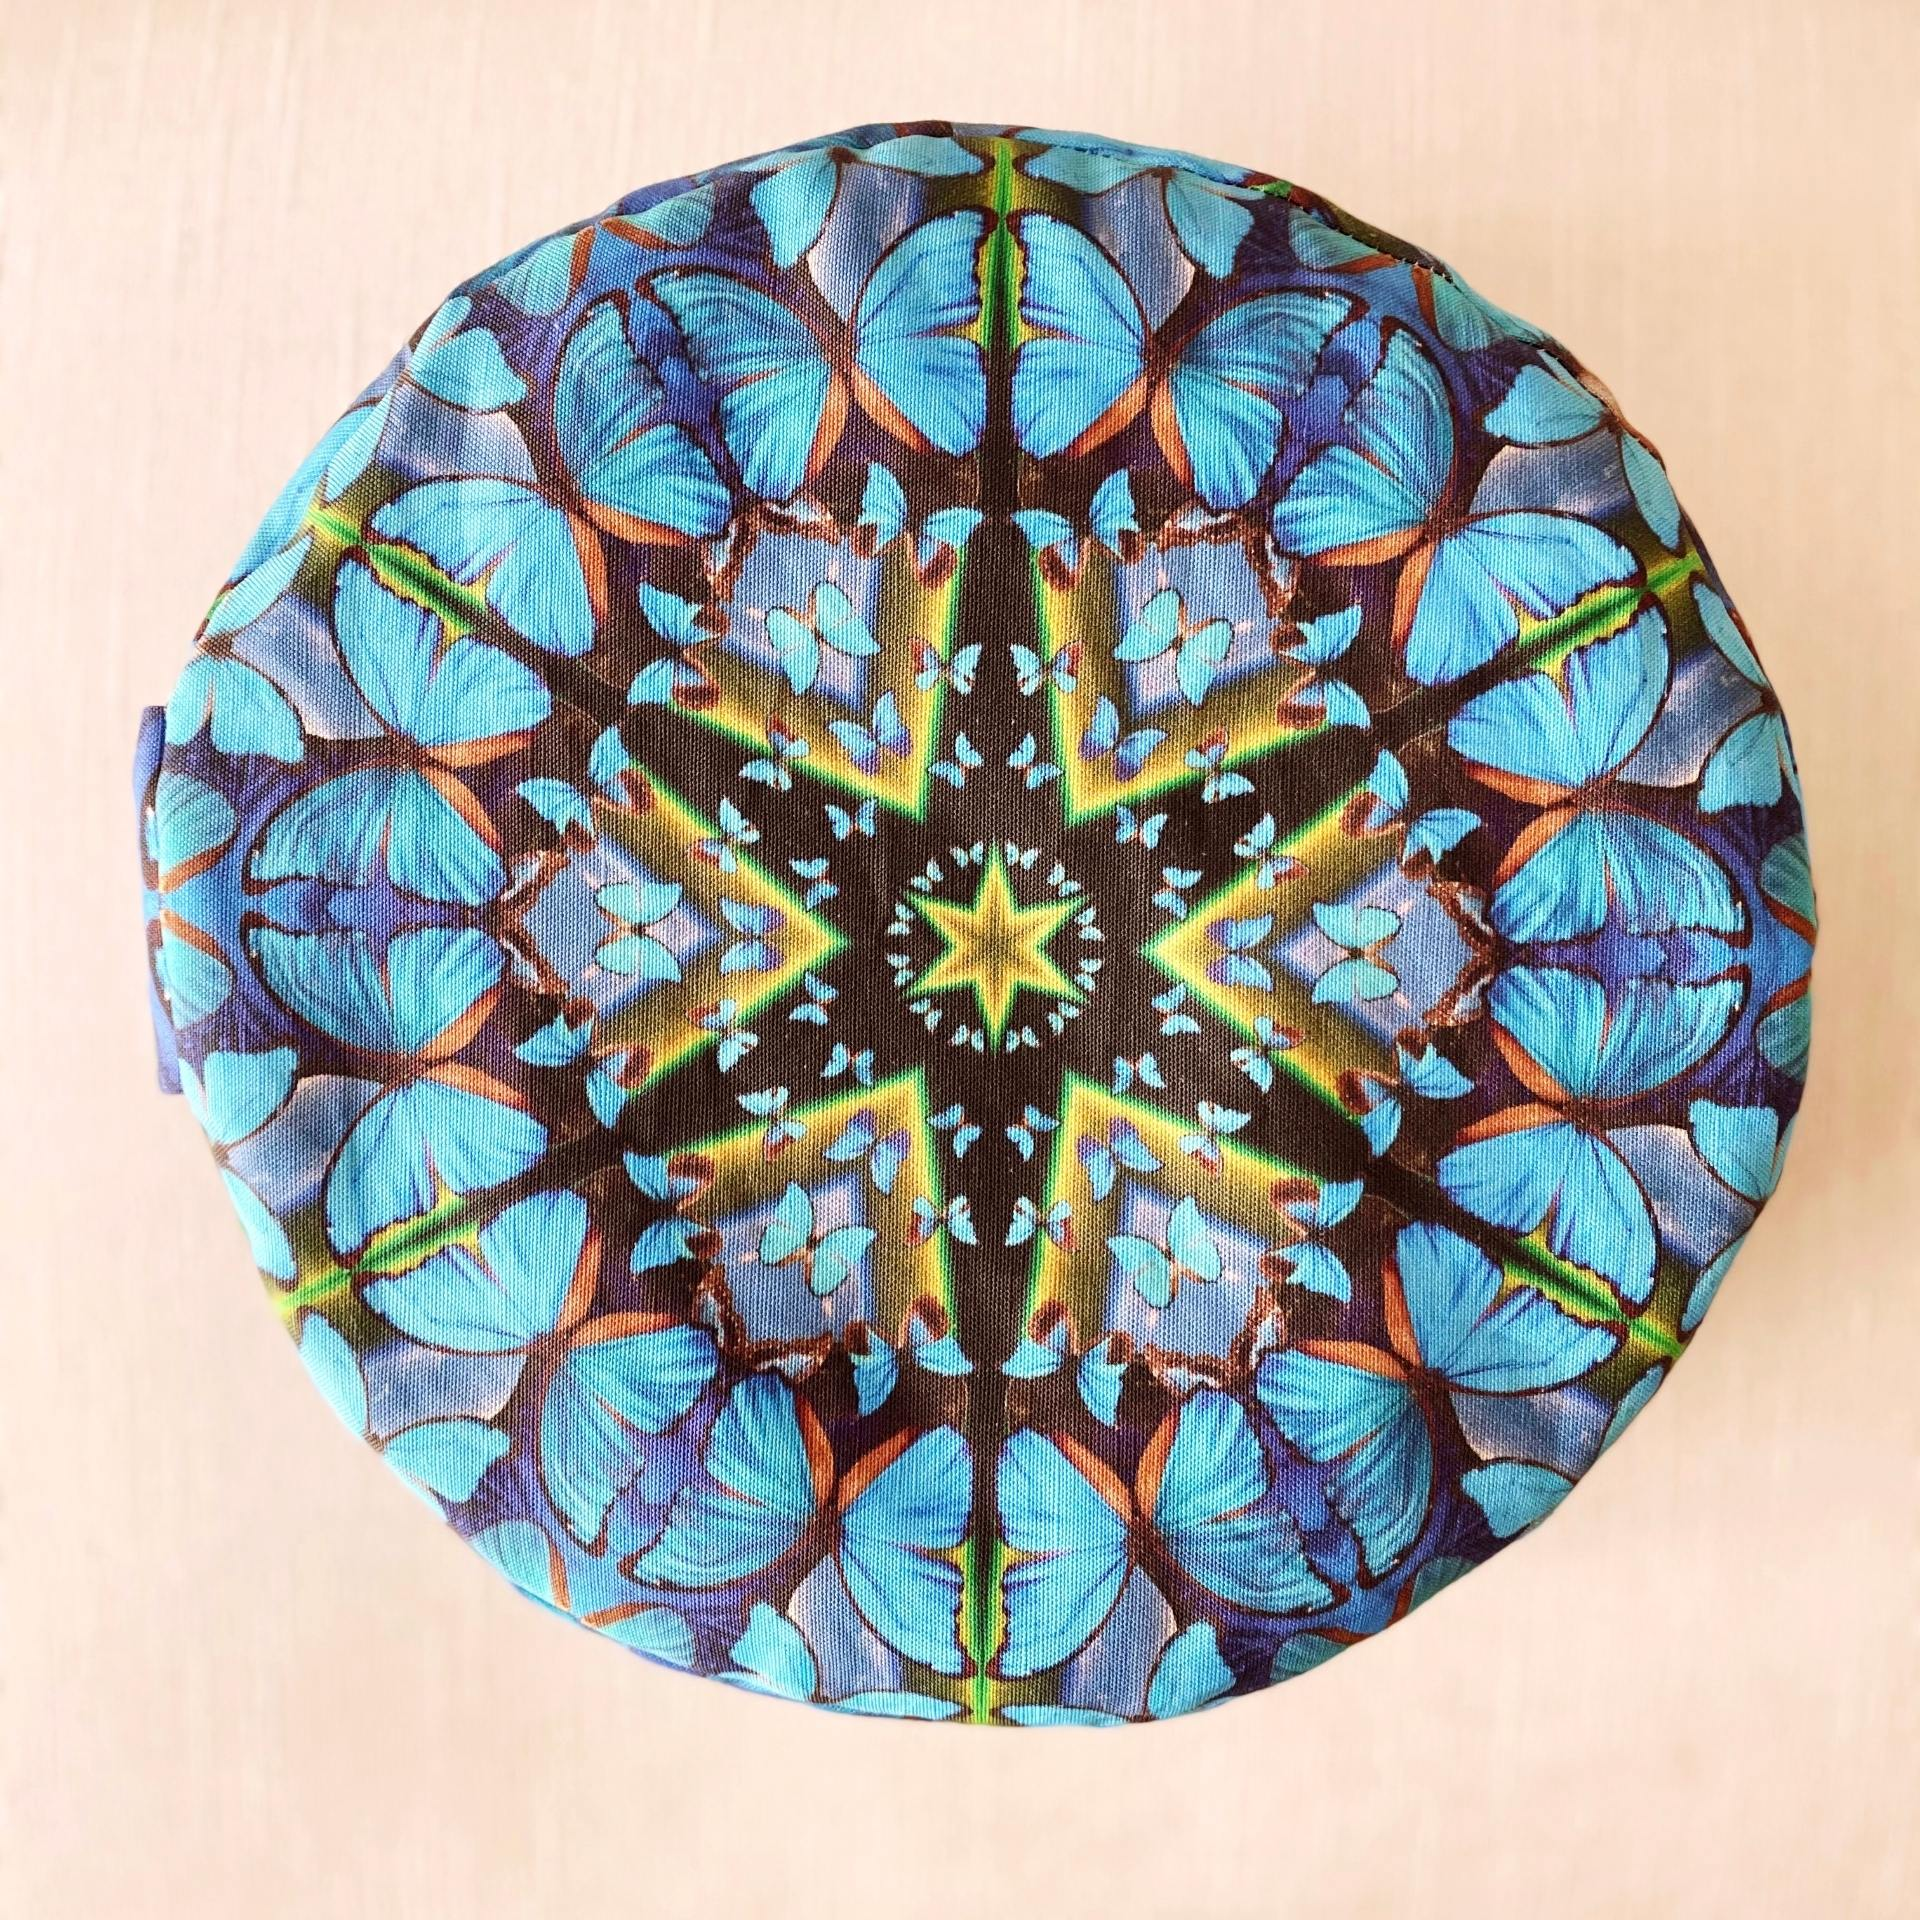 Destiny Blue Butterfly Meditation Cushion